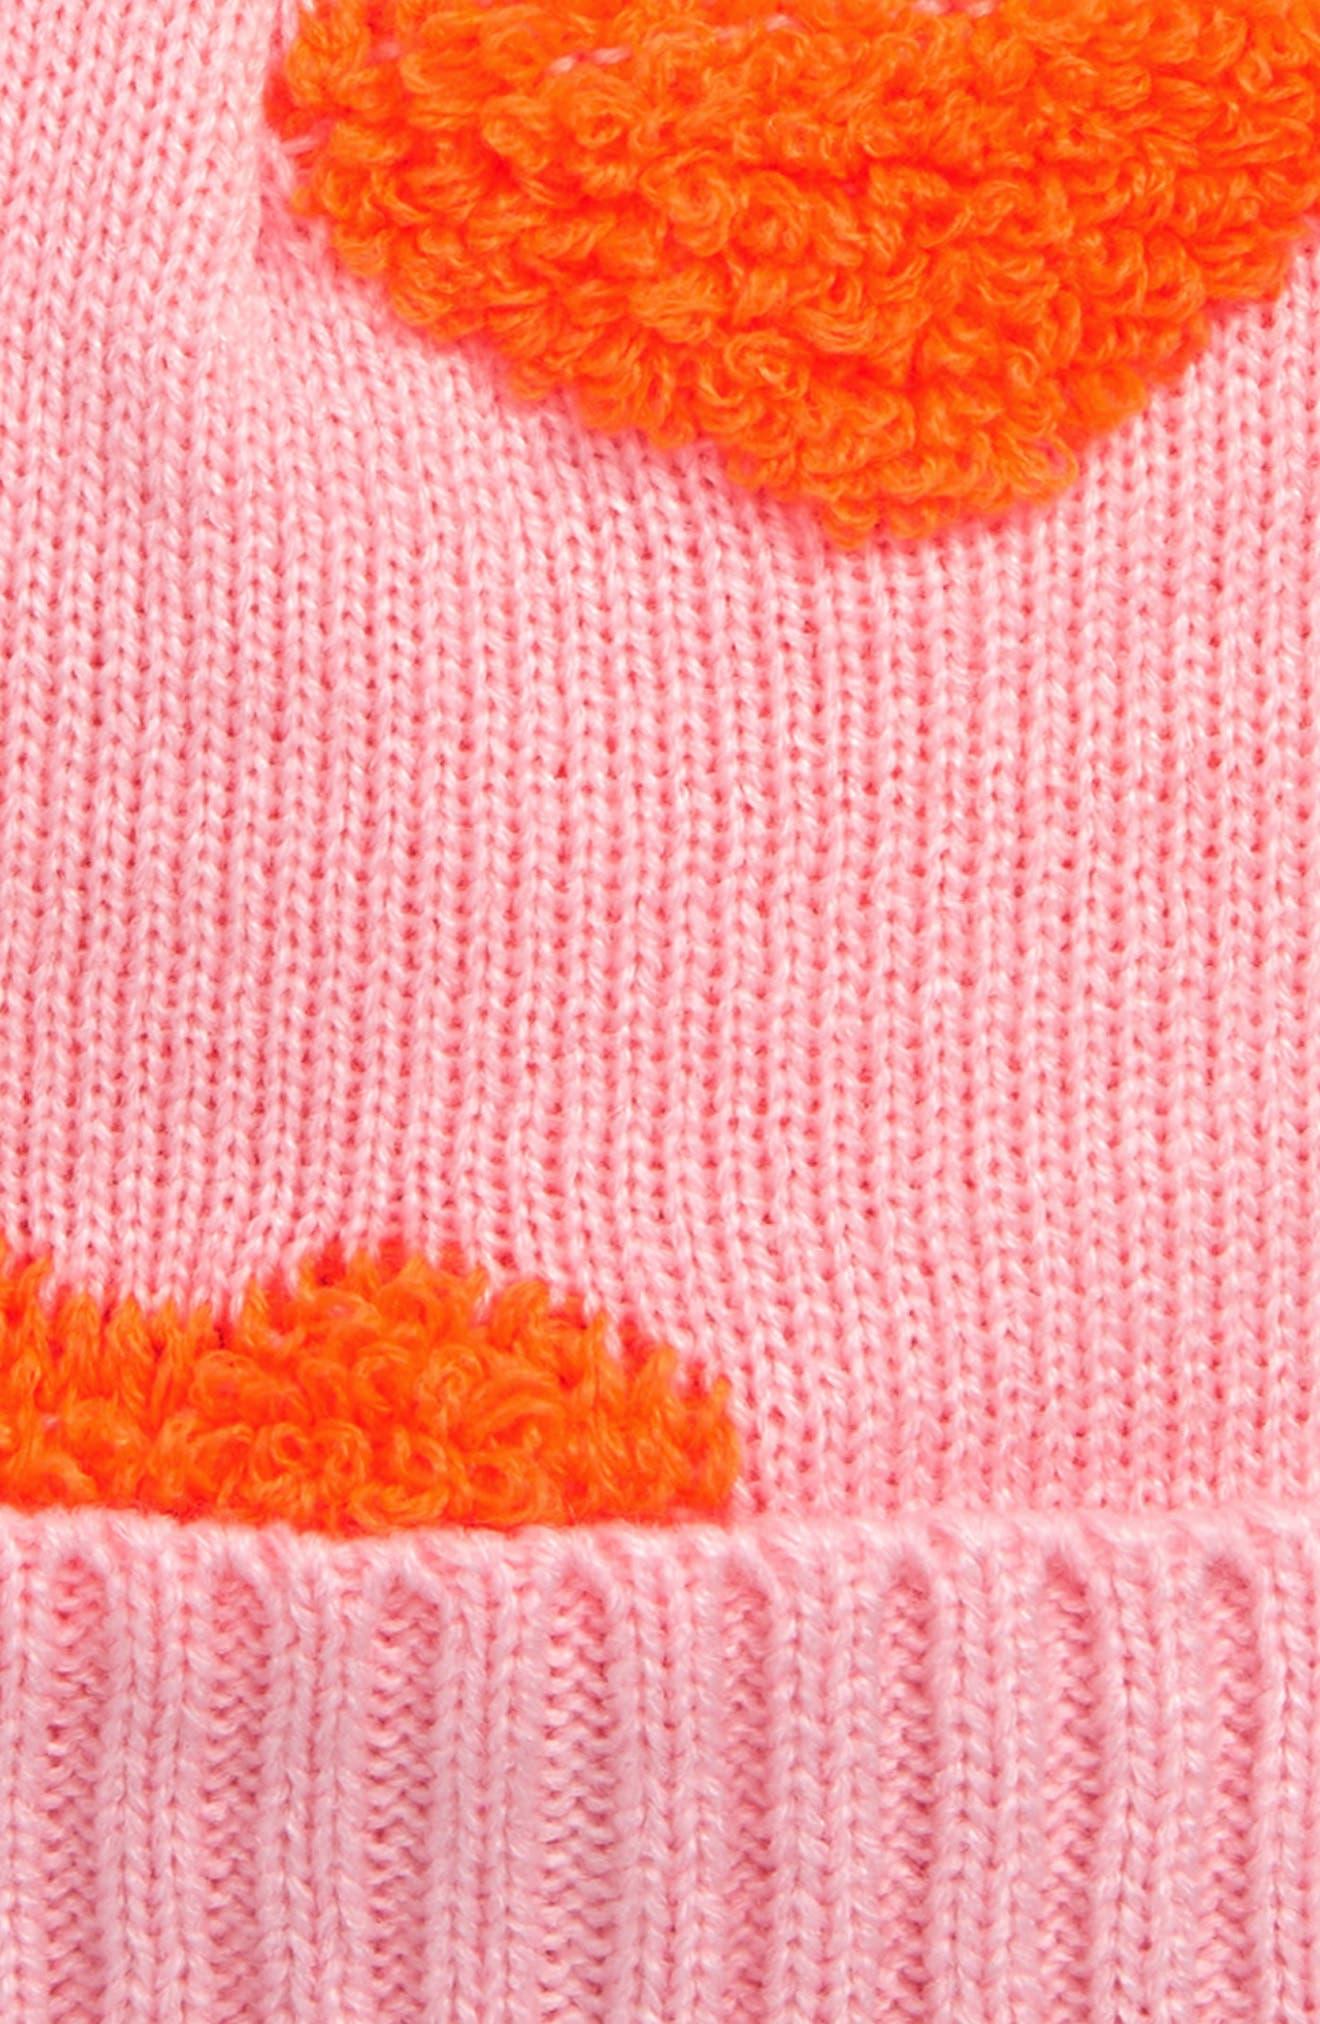 Neon Heart Beanie,                             Alternate thumbnail 2, color,                             PINK PEACHSKIN- PINK HEARTS